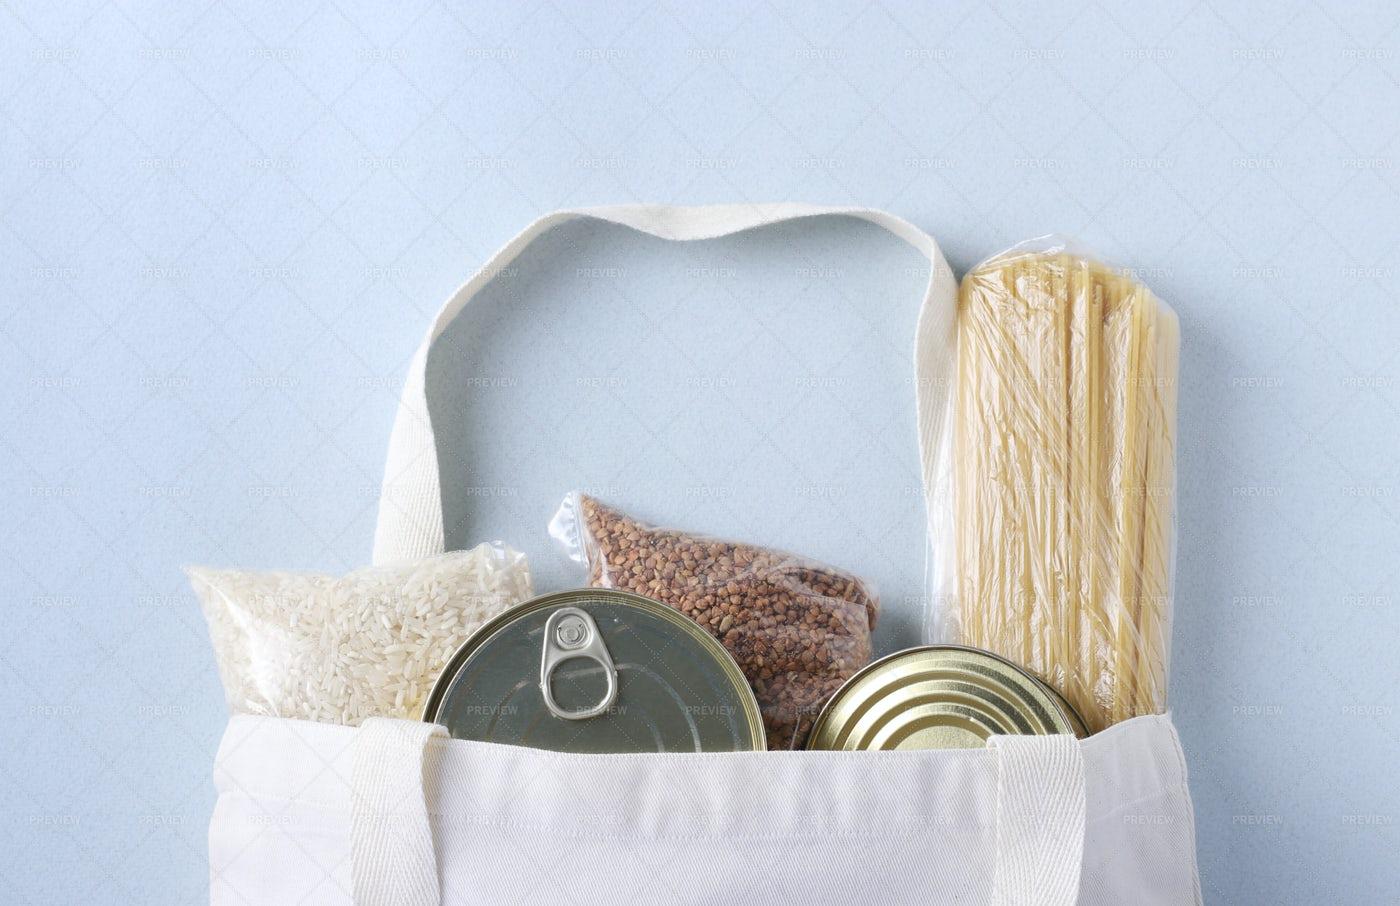 Bag Of Food Essentials: Stock Photos